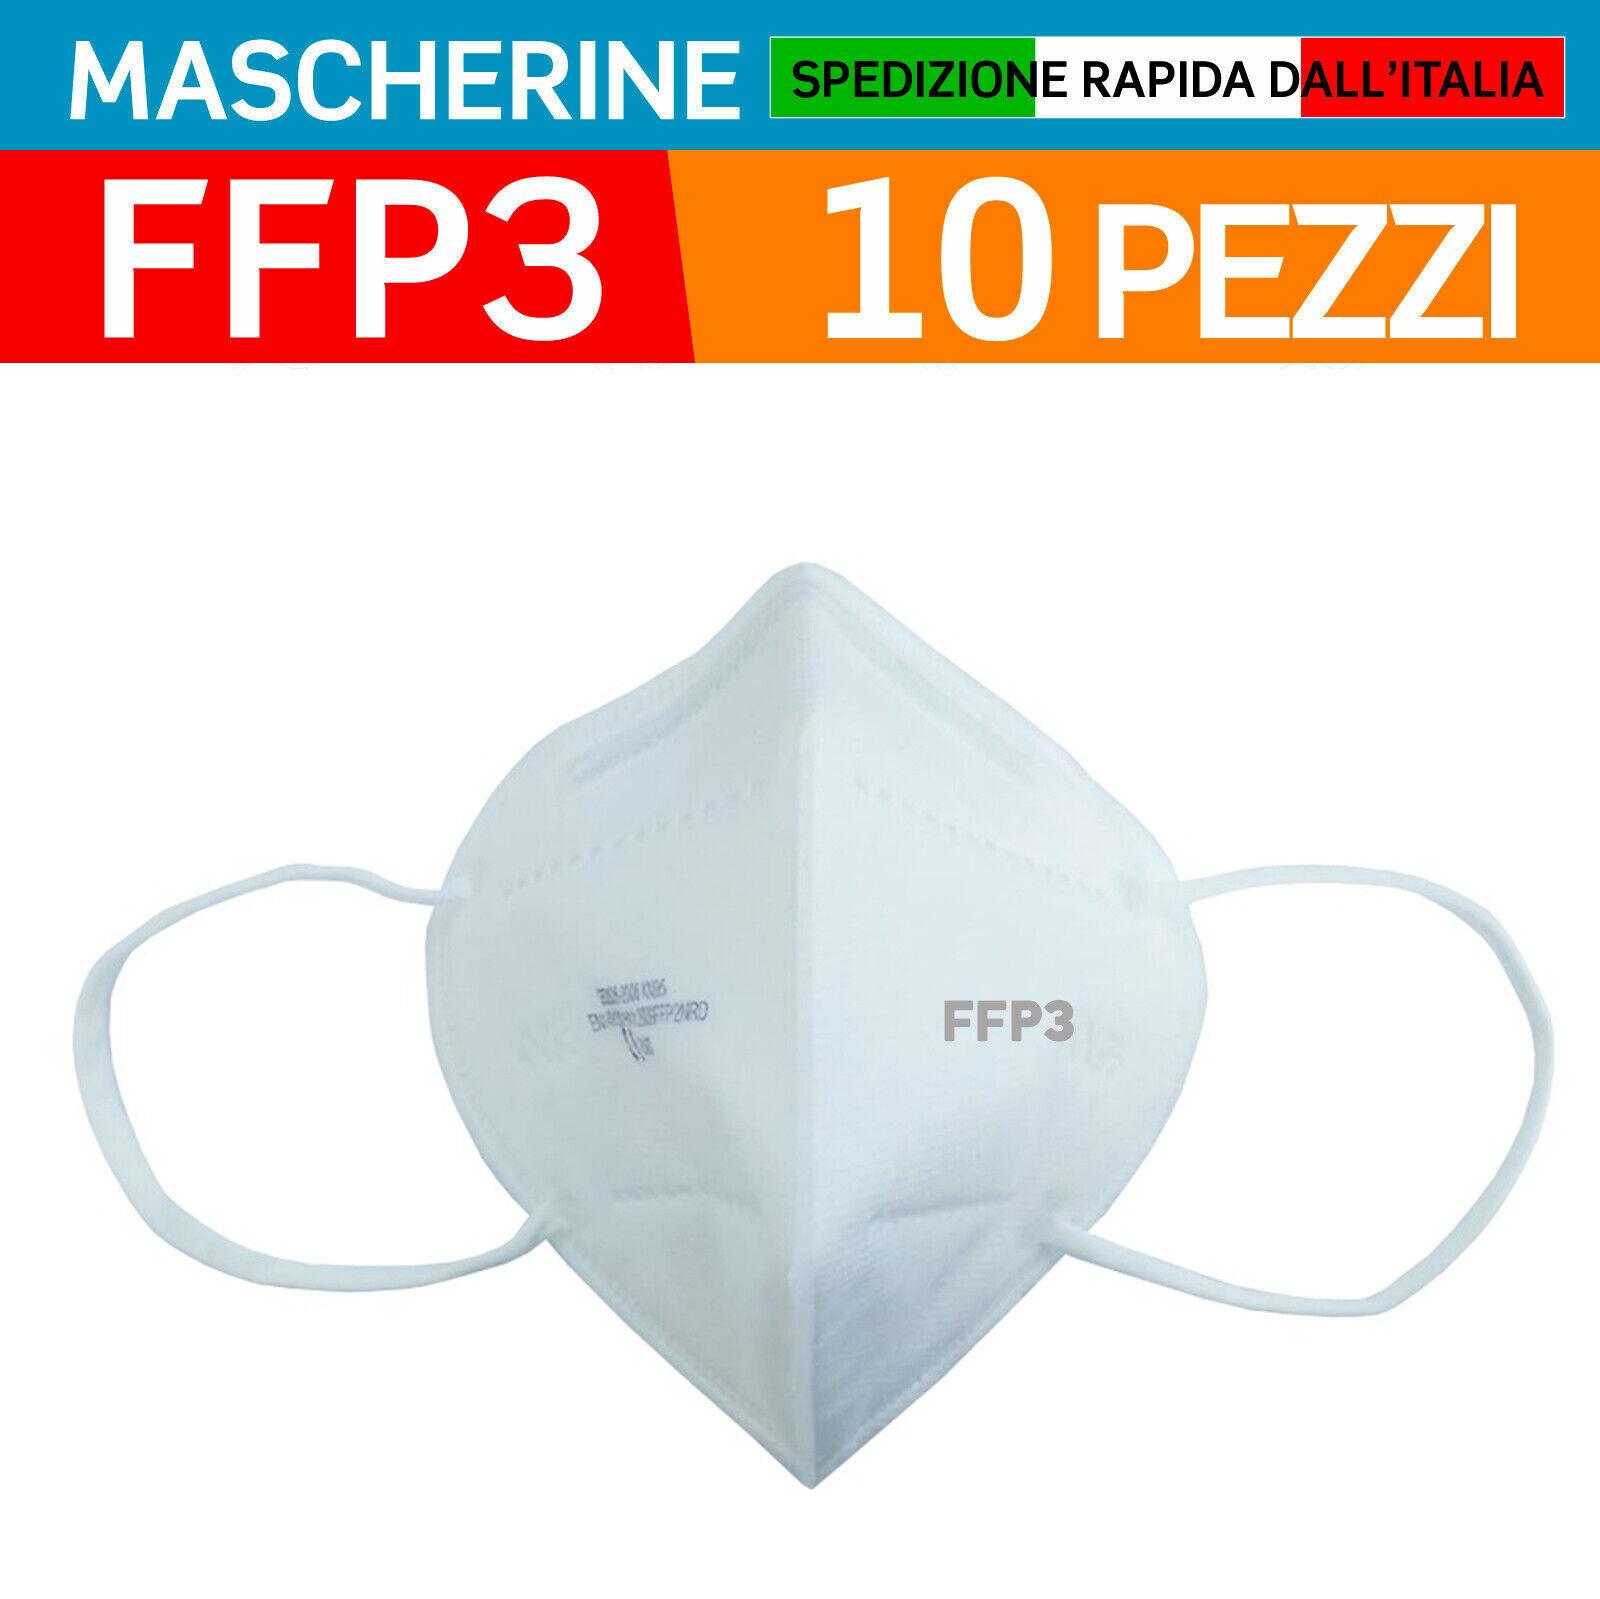 10 MASCHERINE PROTETTIVE FFP3 CERTIFICATE CE 0086 INAIL MASCHERINA SENZA VALVOLA